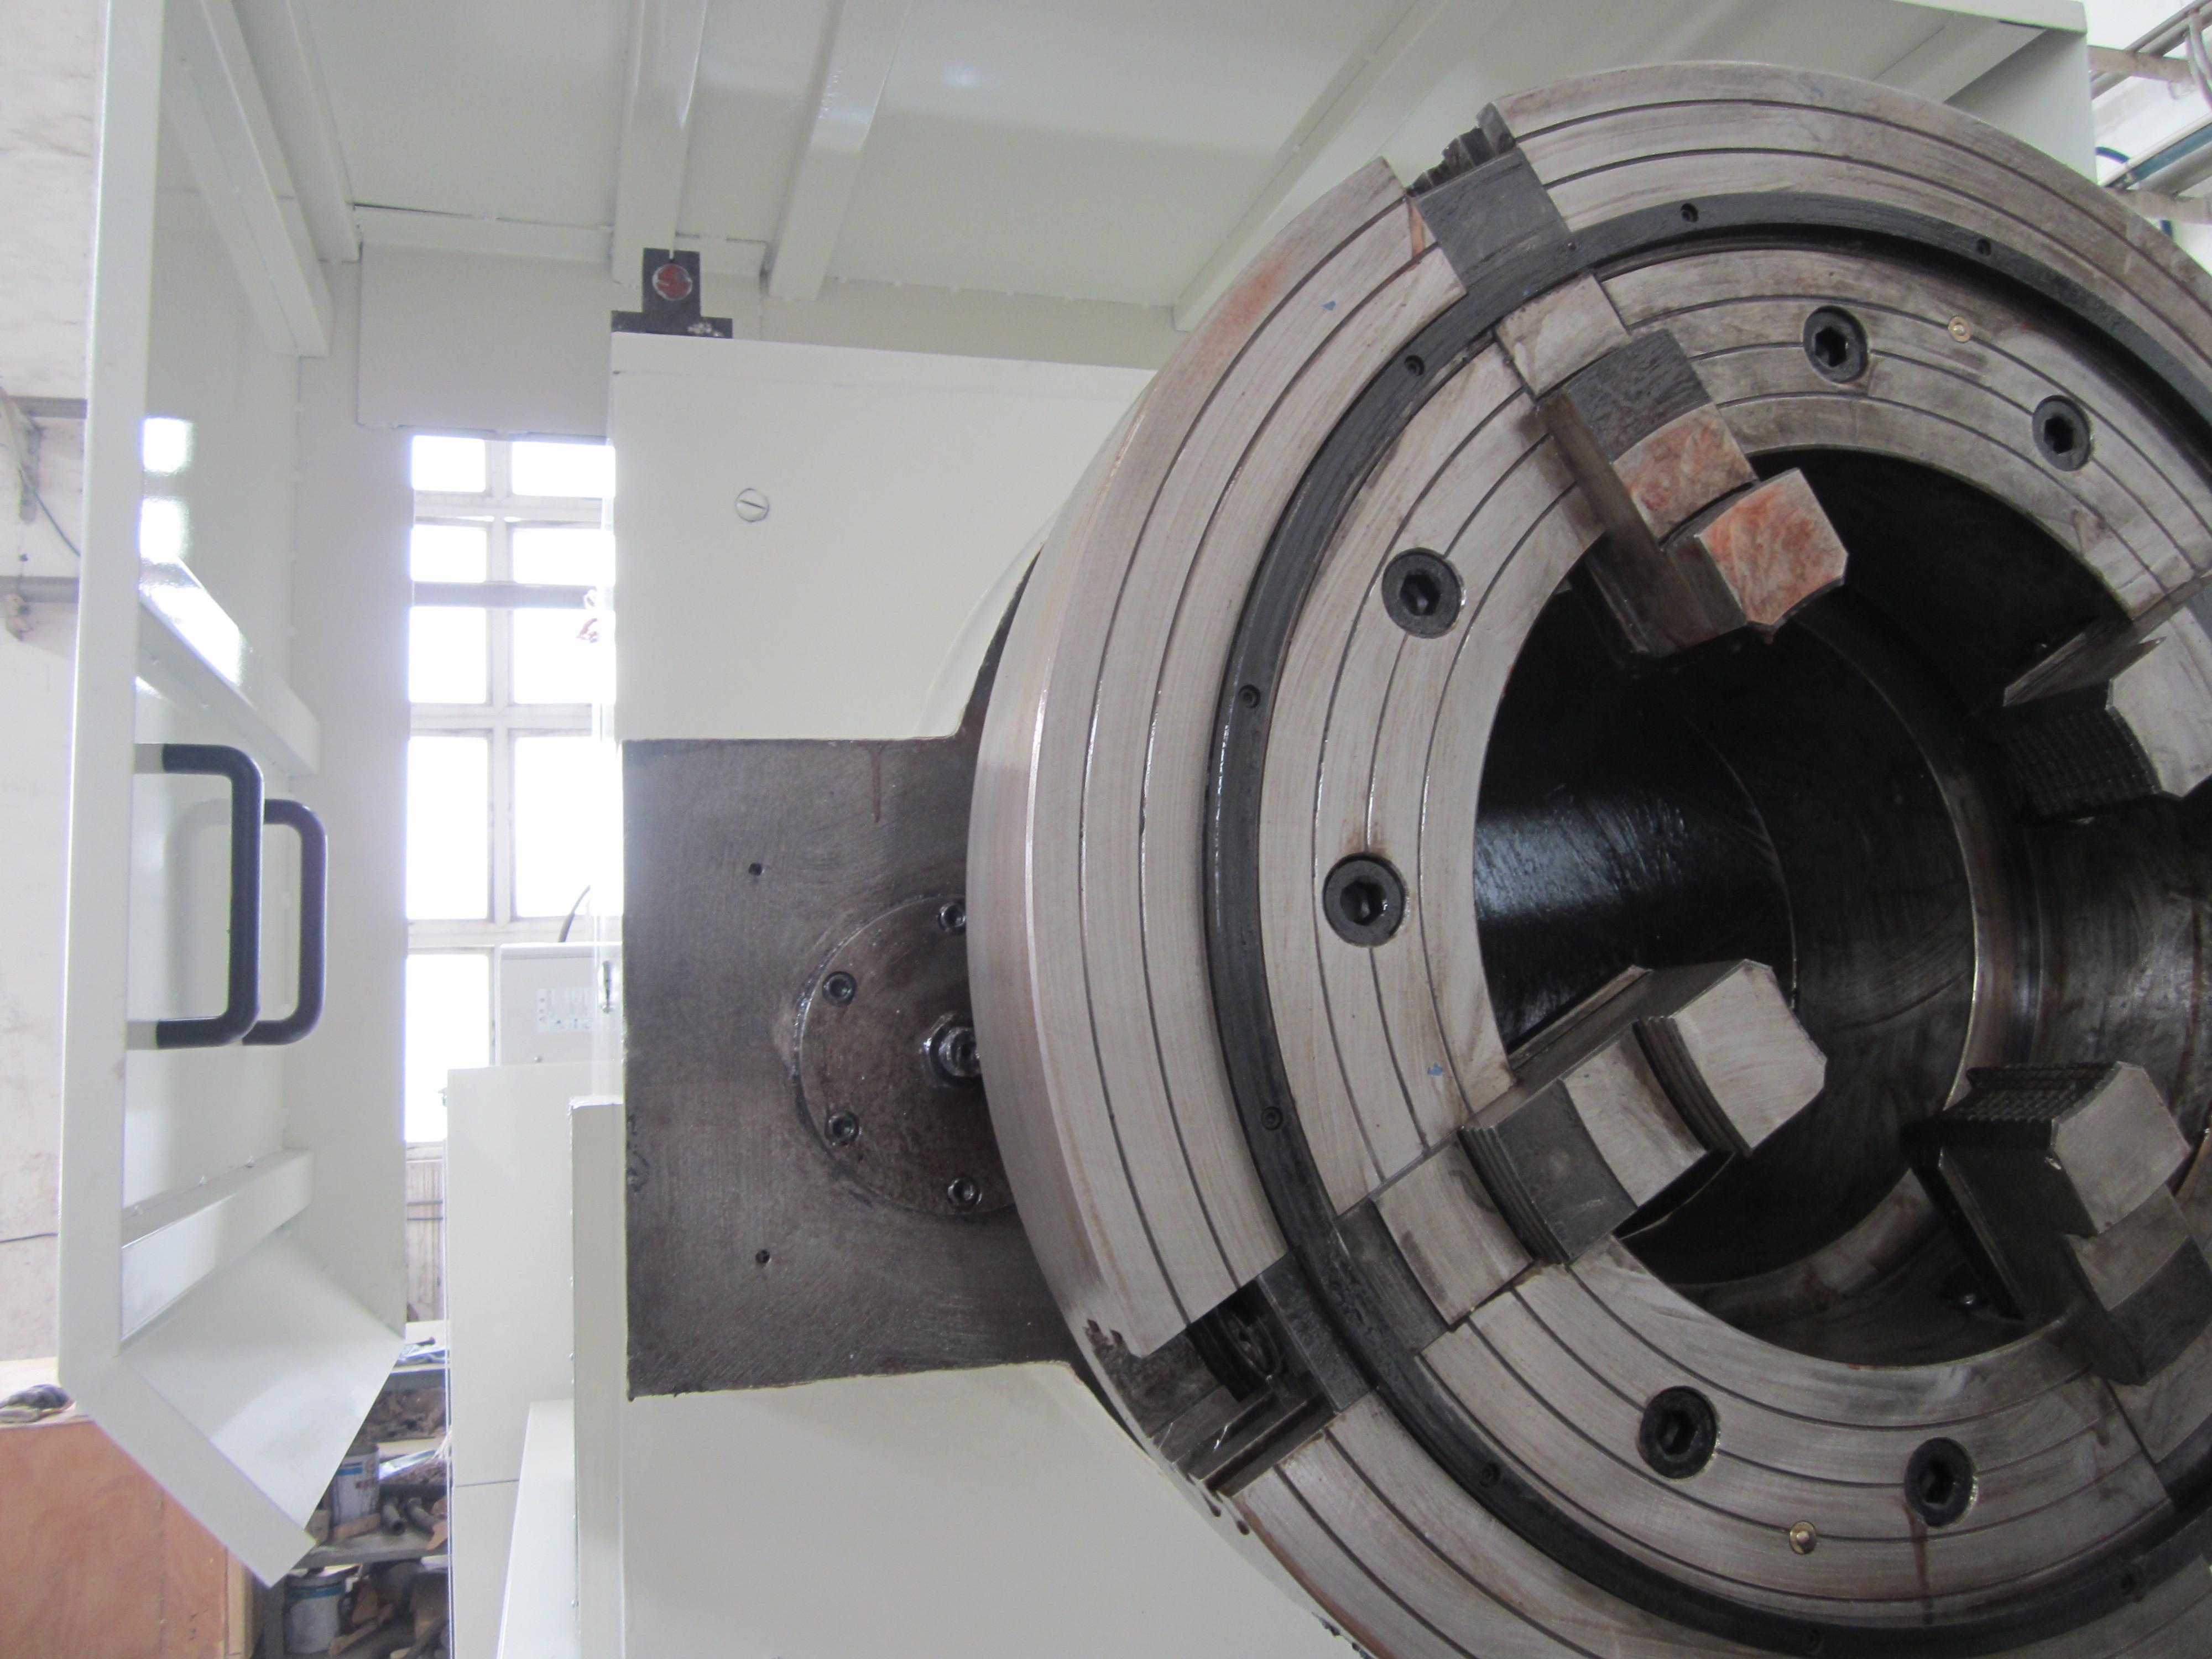 QK1246 China Heavy Duty CNC Pipe Threading and Turning Lathe Machine